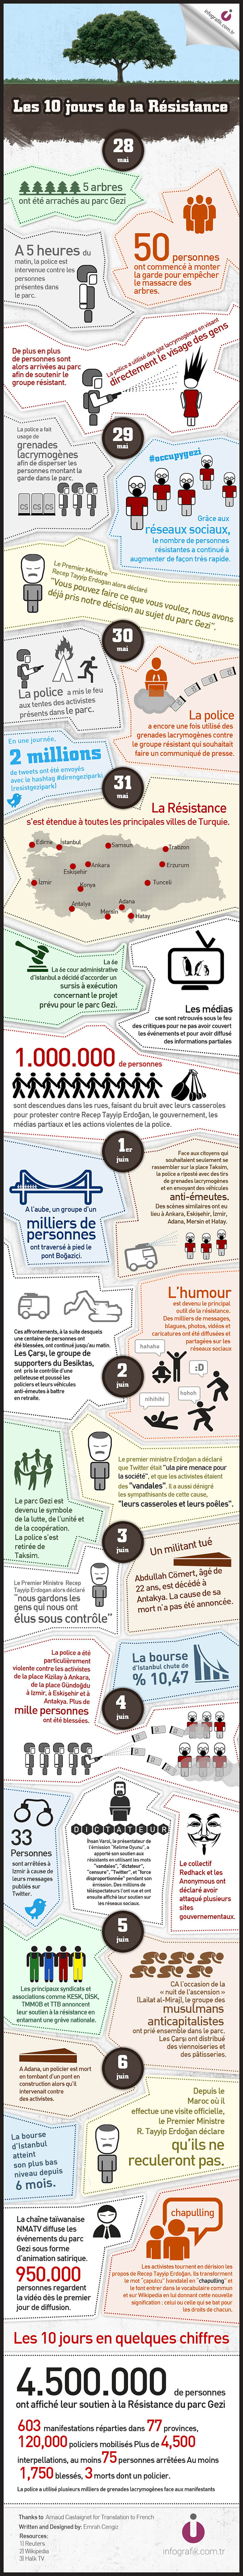 Gezi Parki infographie Français